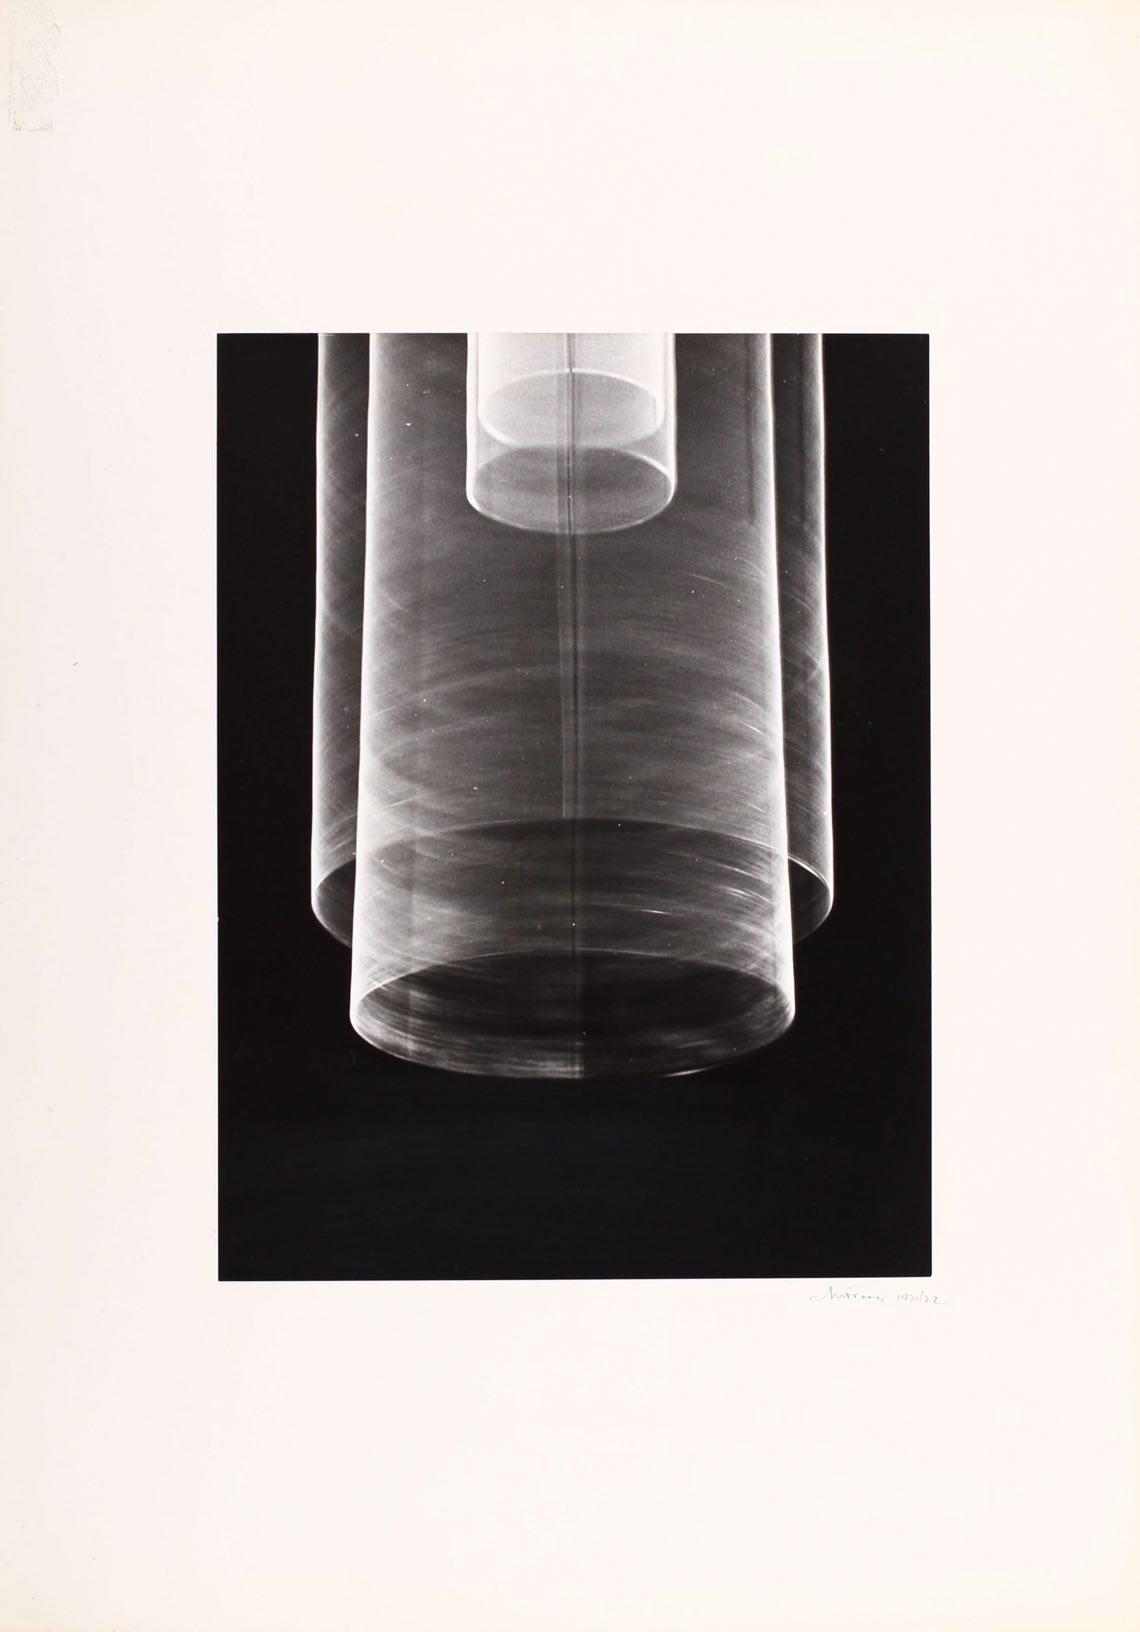 Gianfranco Chiavacci, GF2234, 1971. Stampa vintage ai sali d'argento, 70 x 50 cm. Courtesy Die Mauer Arte Contemporanea, Prato